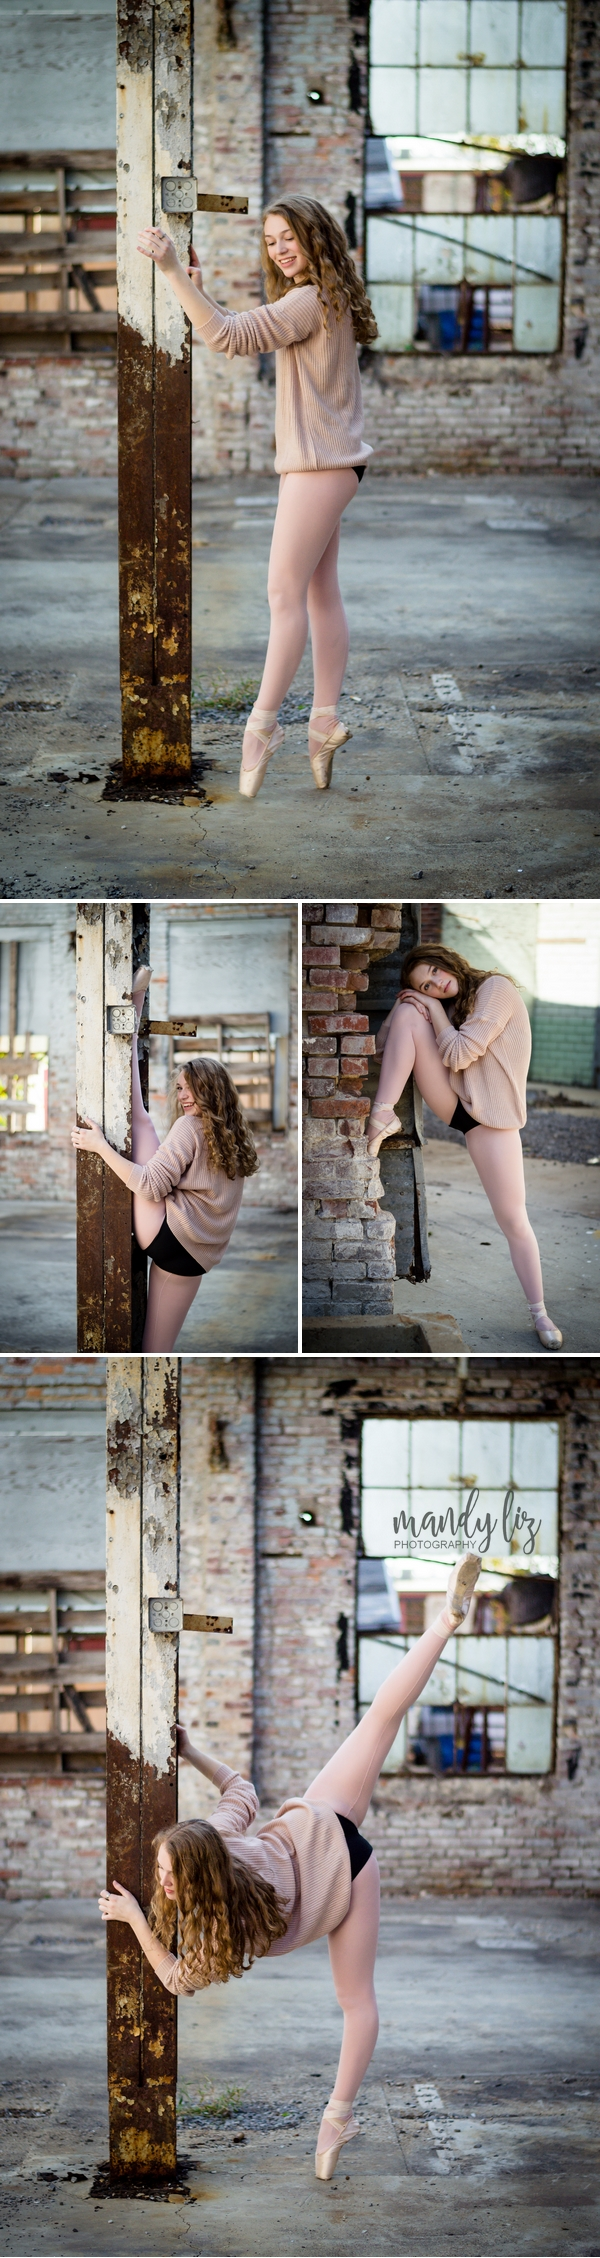 Nashville-senior-photographer-City-Urban-Ballerina-Ballet-Session (13)